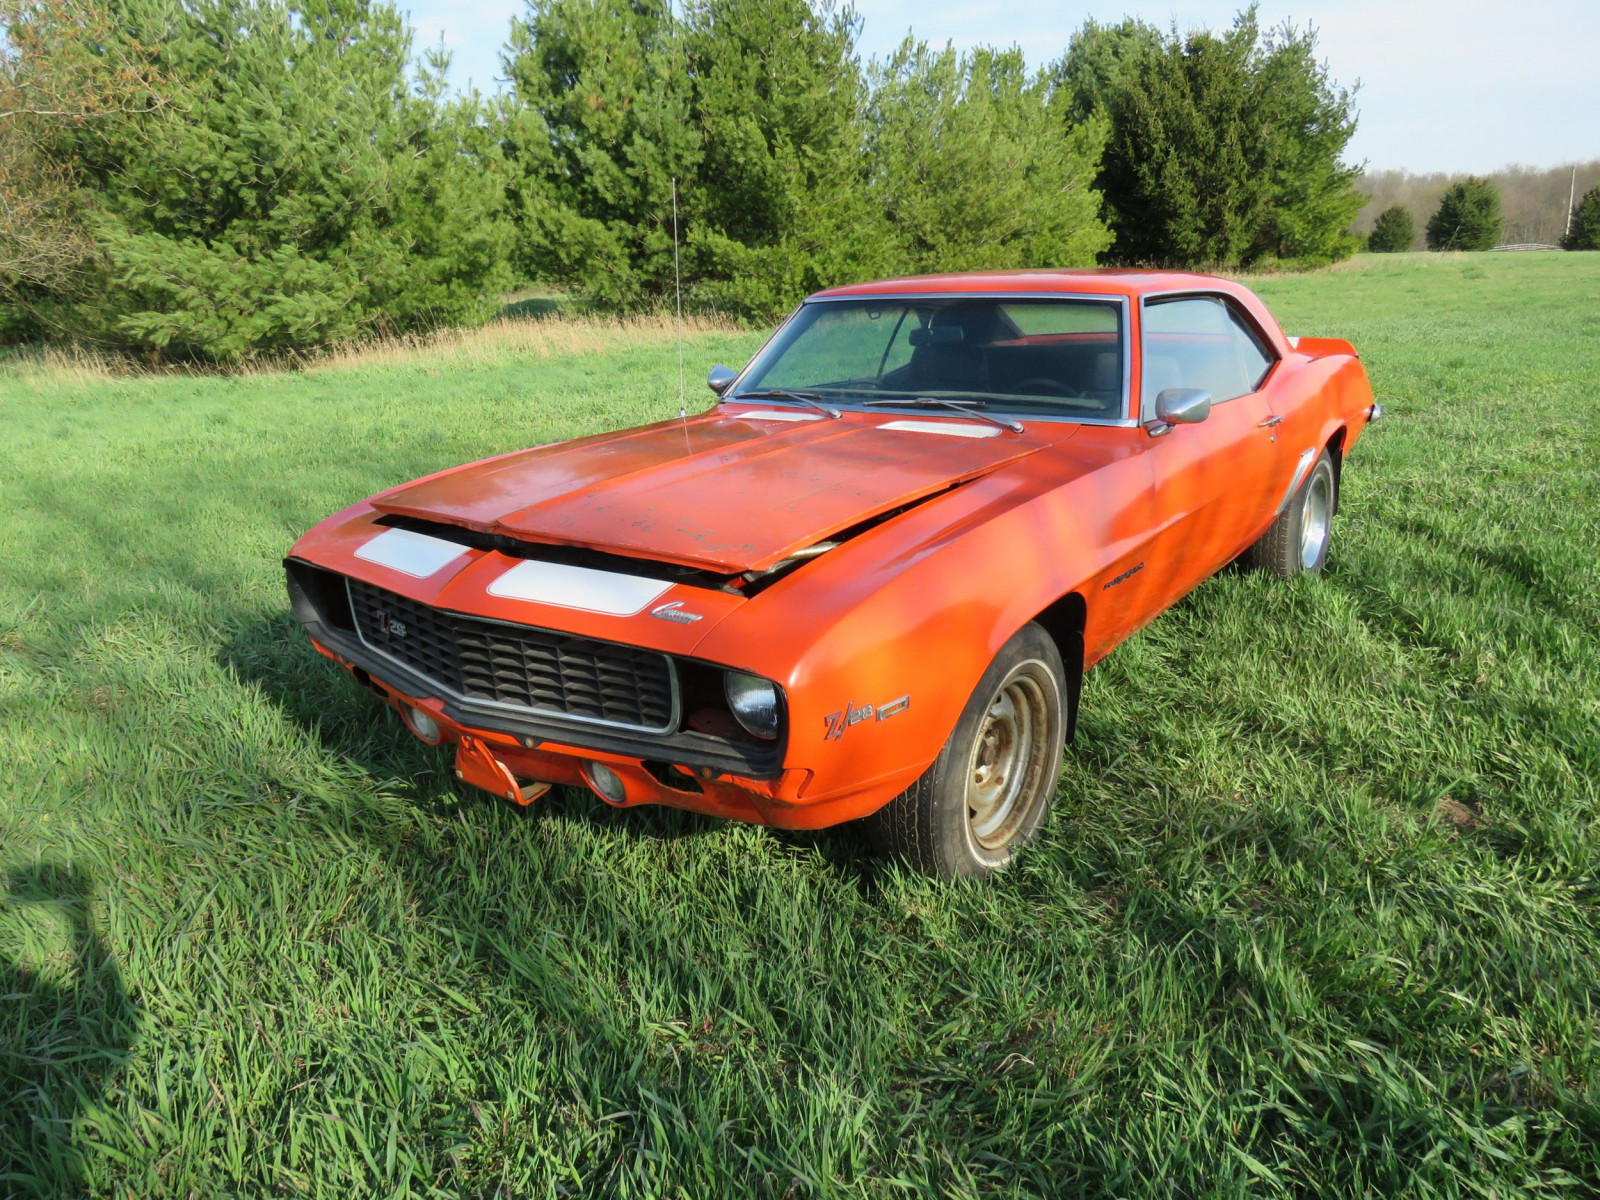 1969 Chevrolet Camaro Z/28 RS Coupe barn find orange